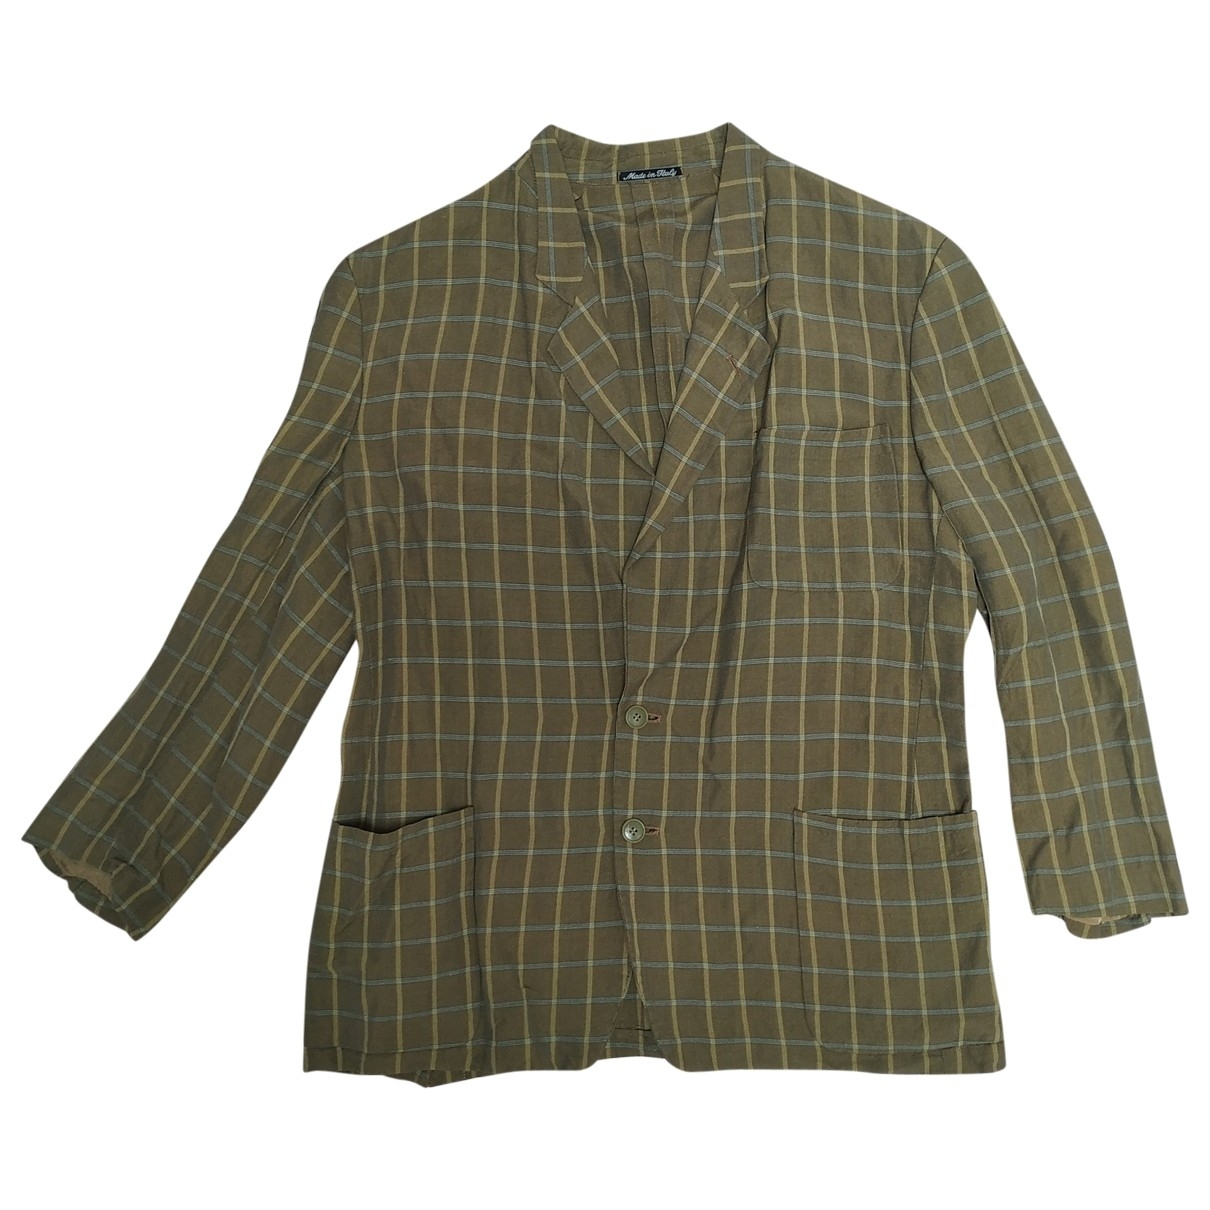 Emporio Armani \N Beige Linen jacket  for Men 50 IT